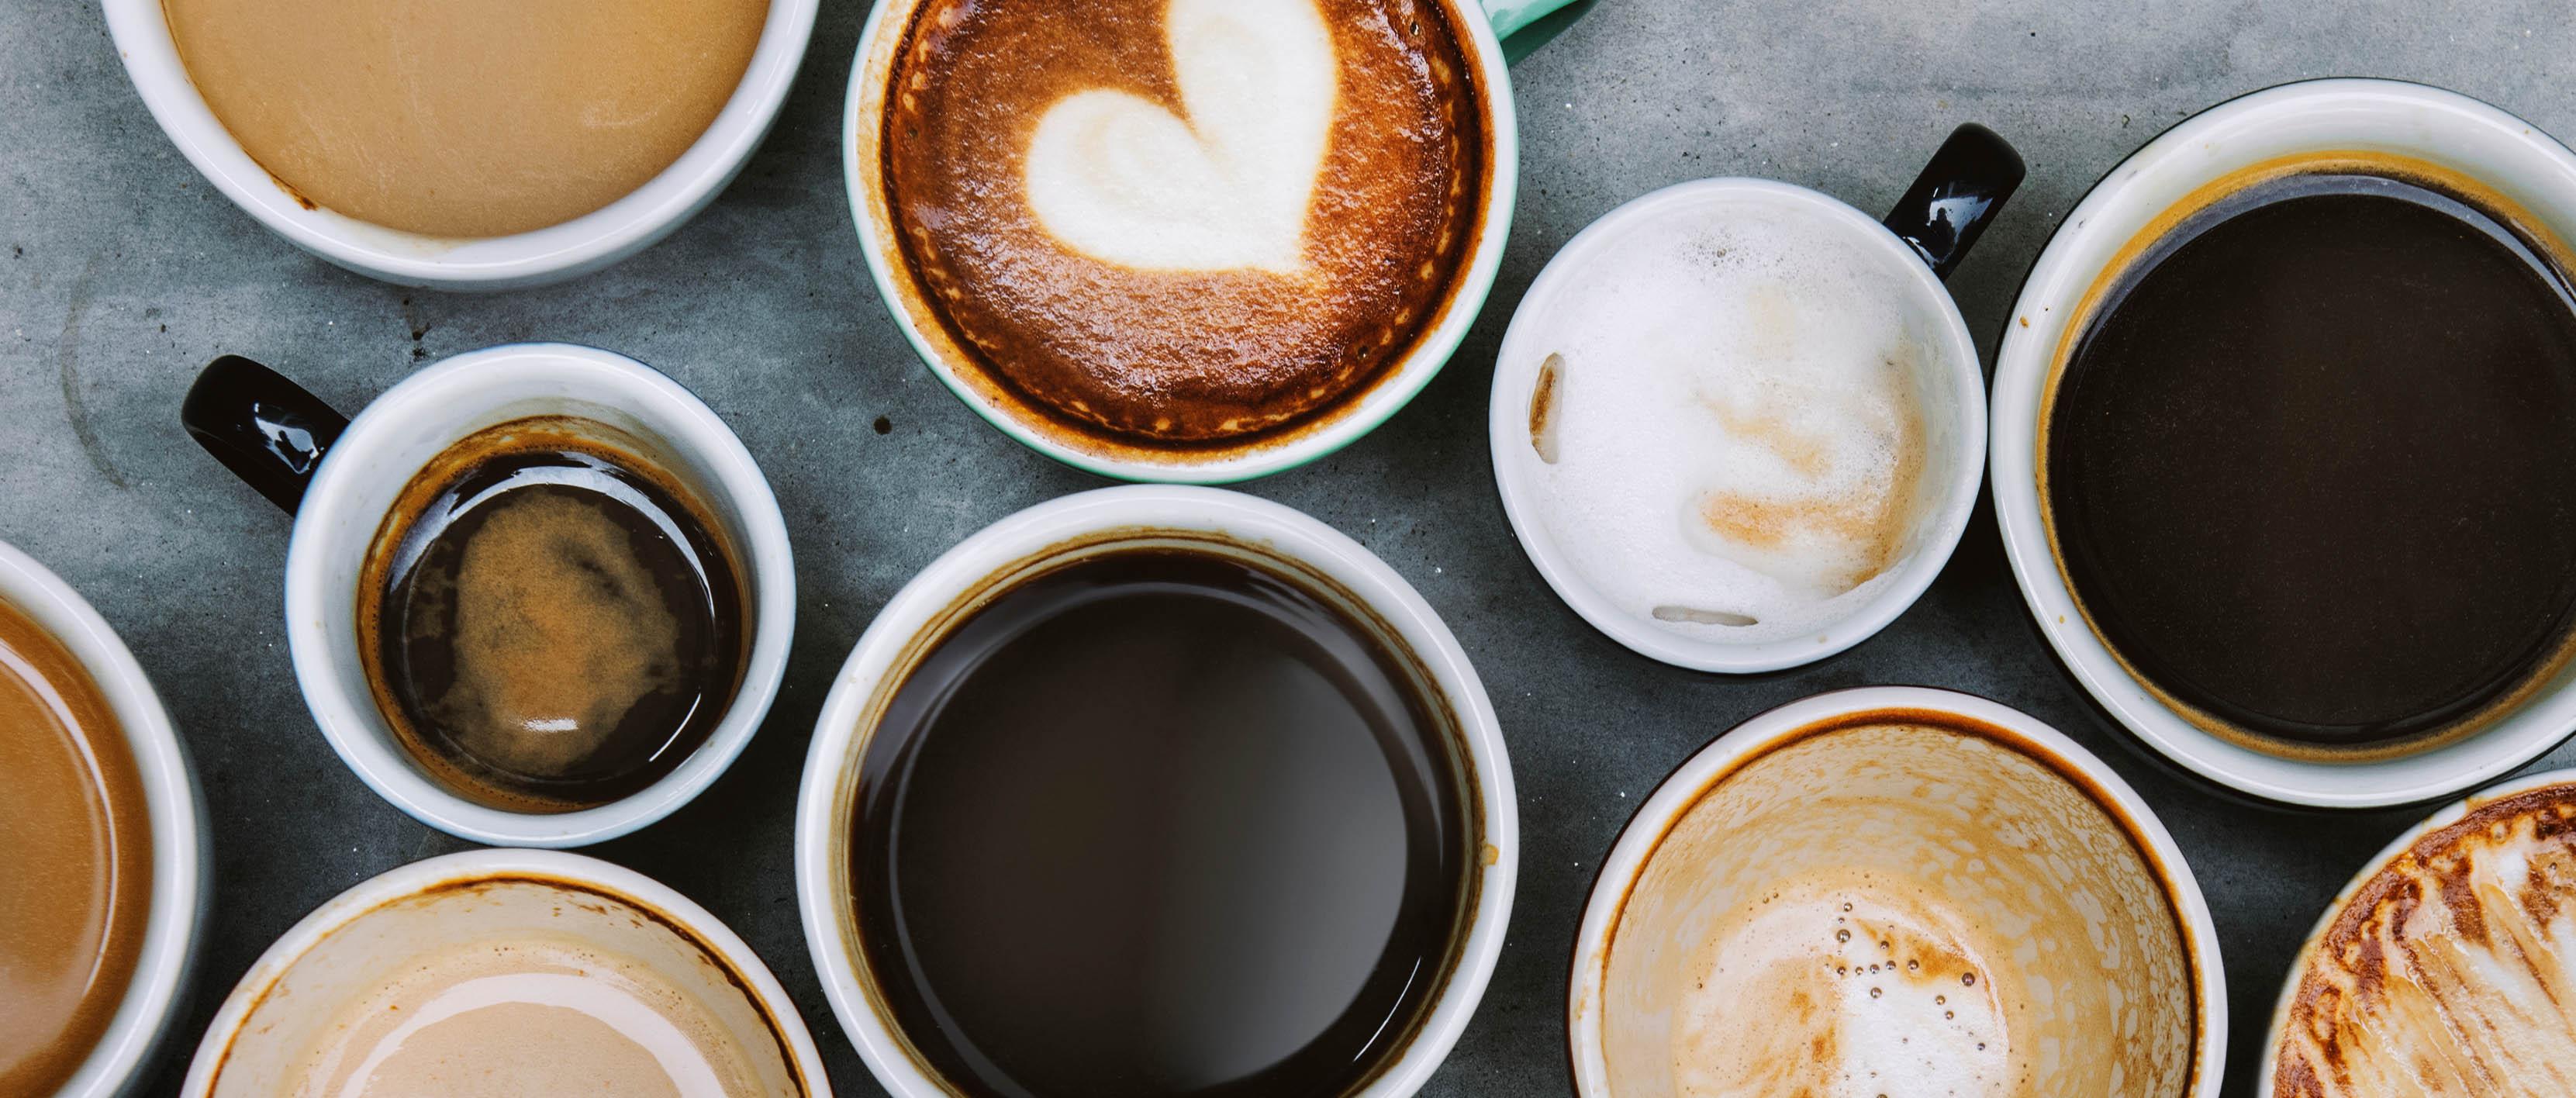 Sip, Slurp, Savor: The S.F. Coffee Festival is Coming Up